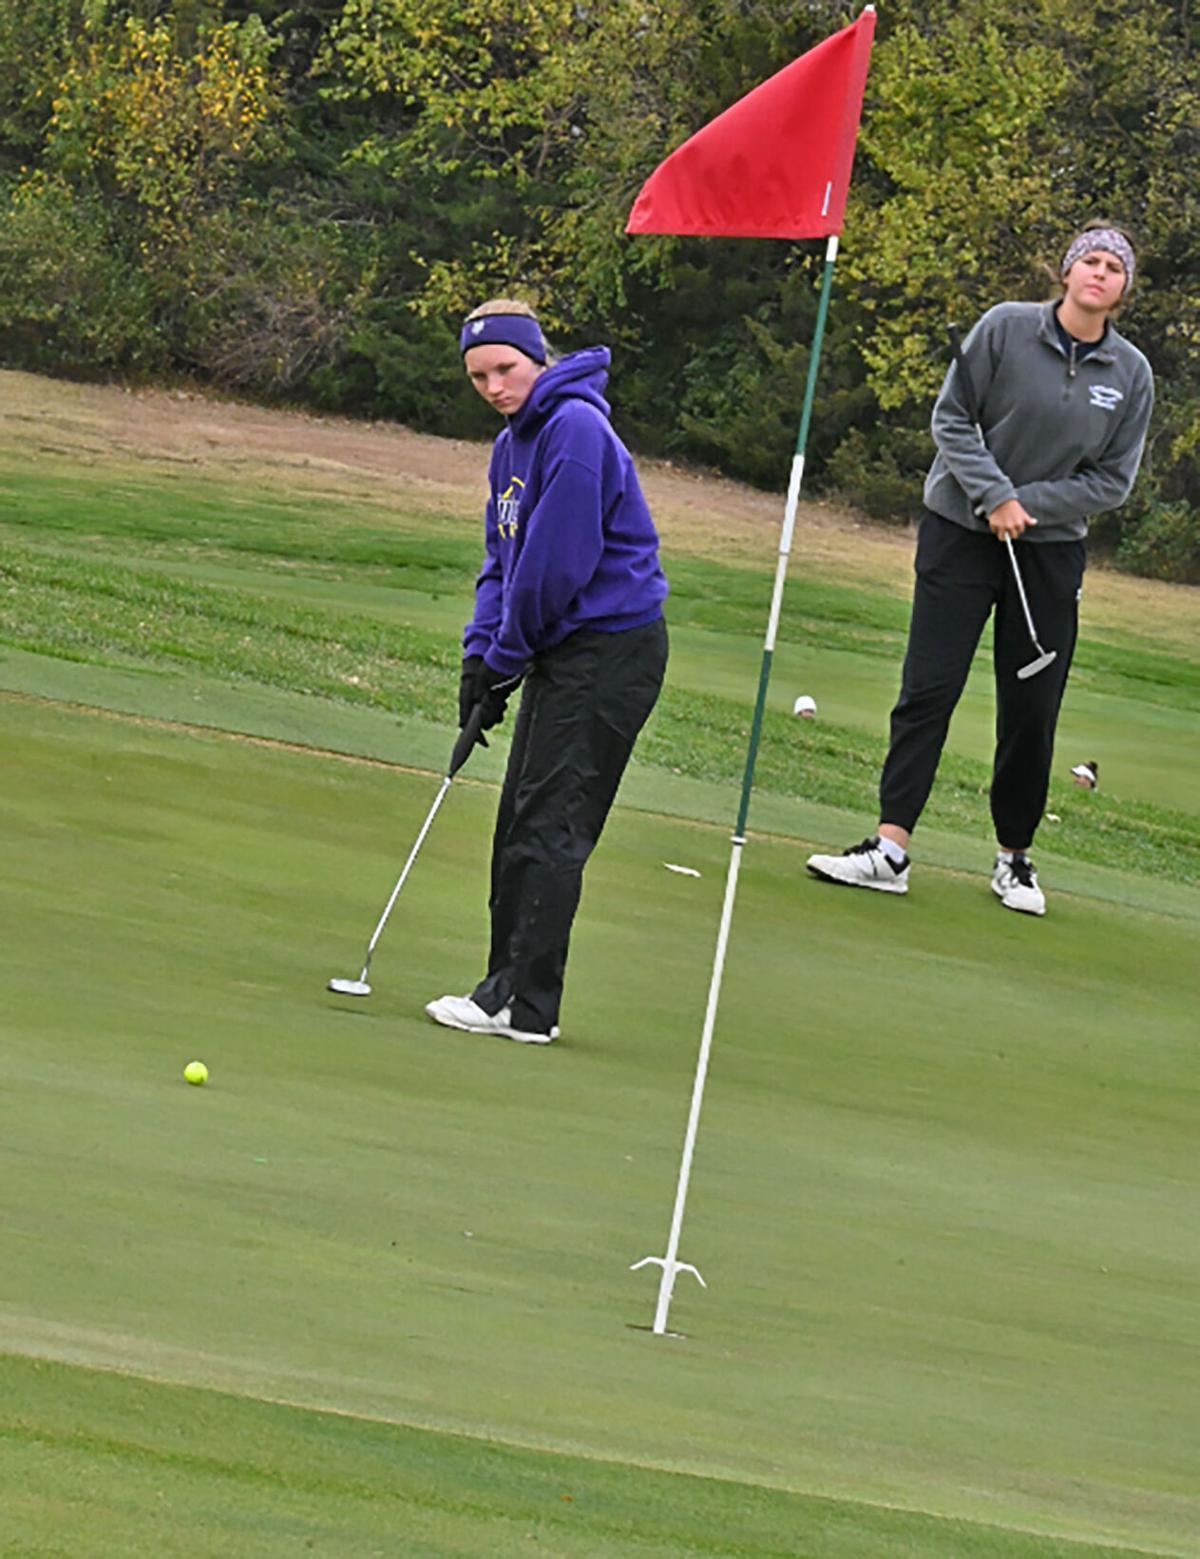 Winfield Lady Vikings capture KSHSAA Class 4A State girls golf title